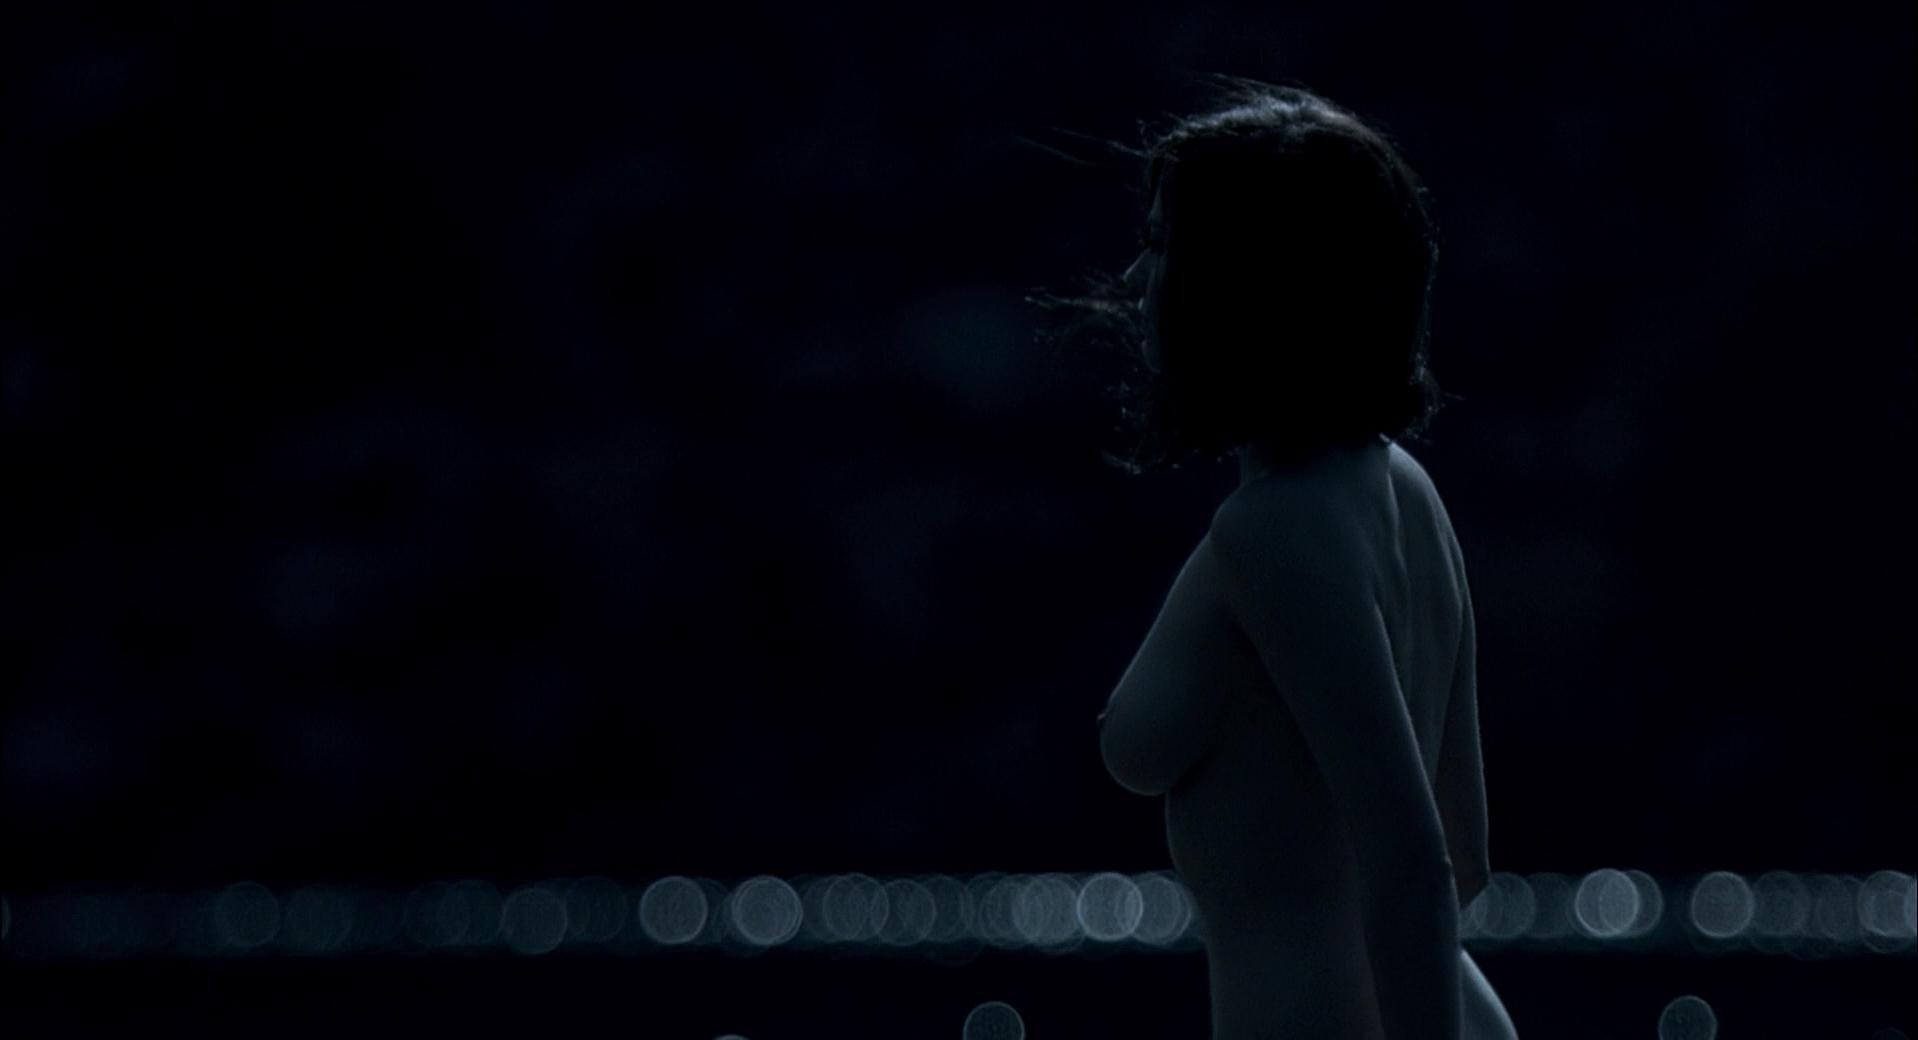 Maria Valverde nude, Eva Green nude - Cracks (2009)